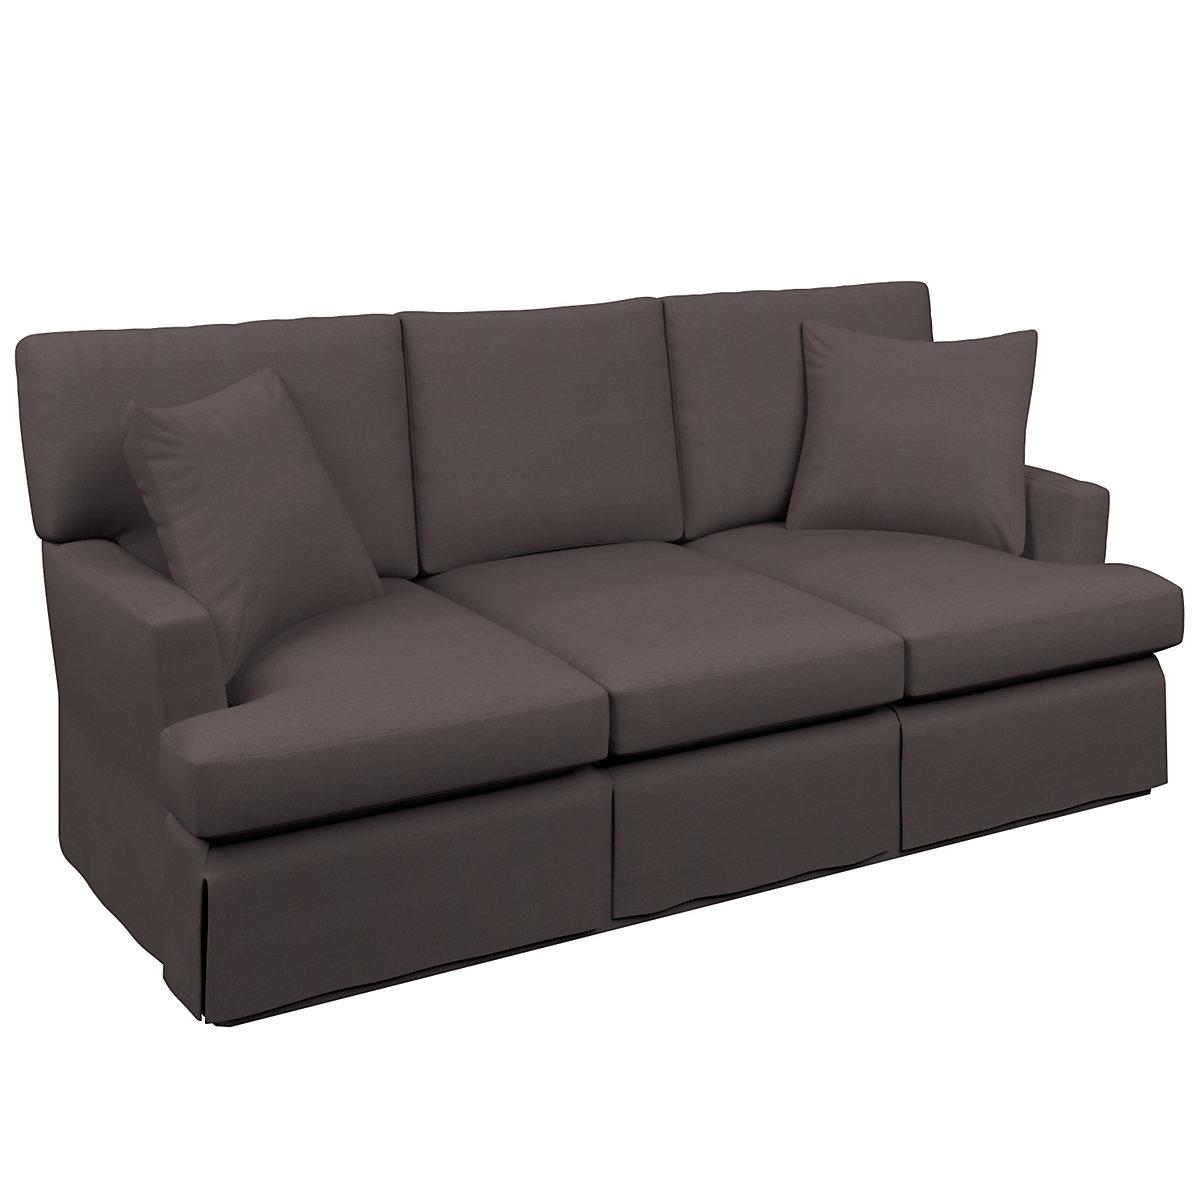 Estate linen shale saybrook 3 seater upholstered sofa for Shale sofa bed